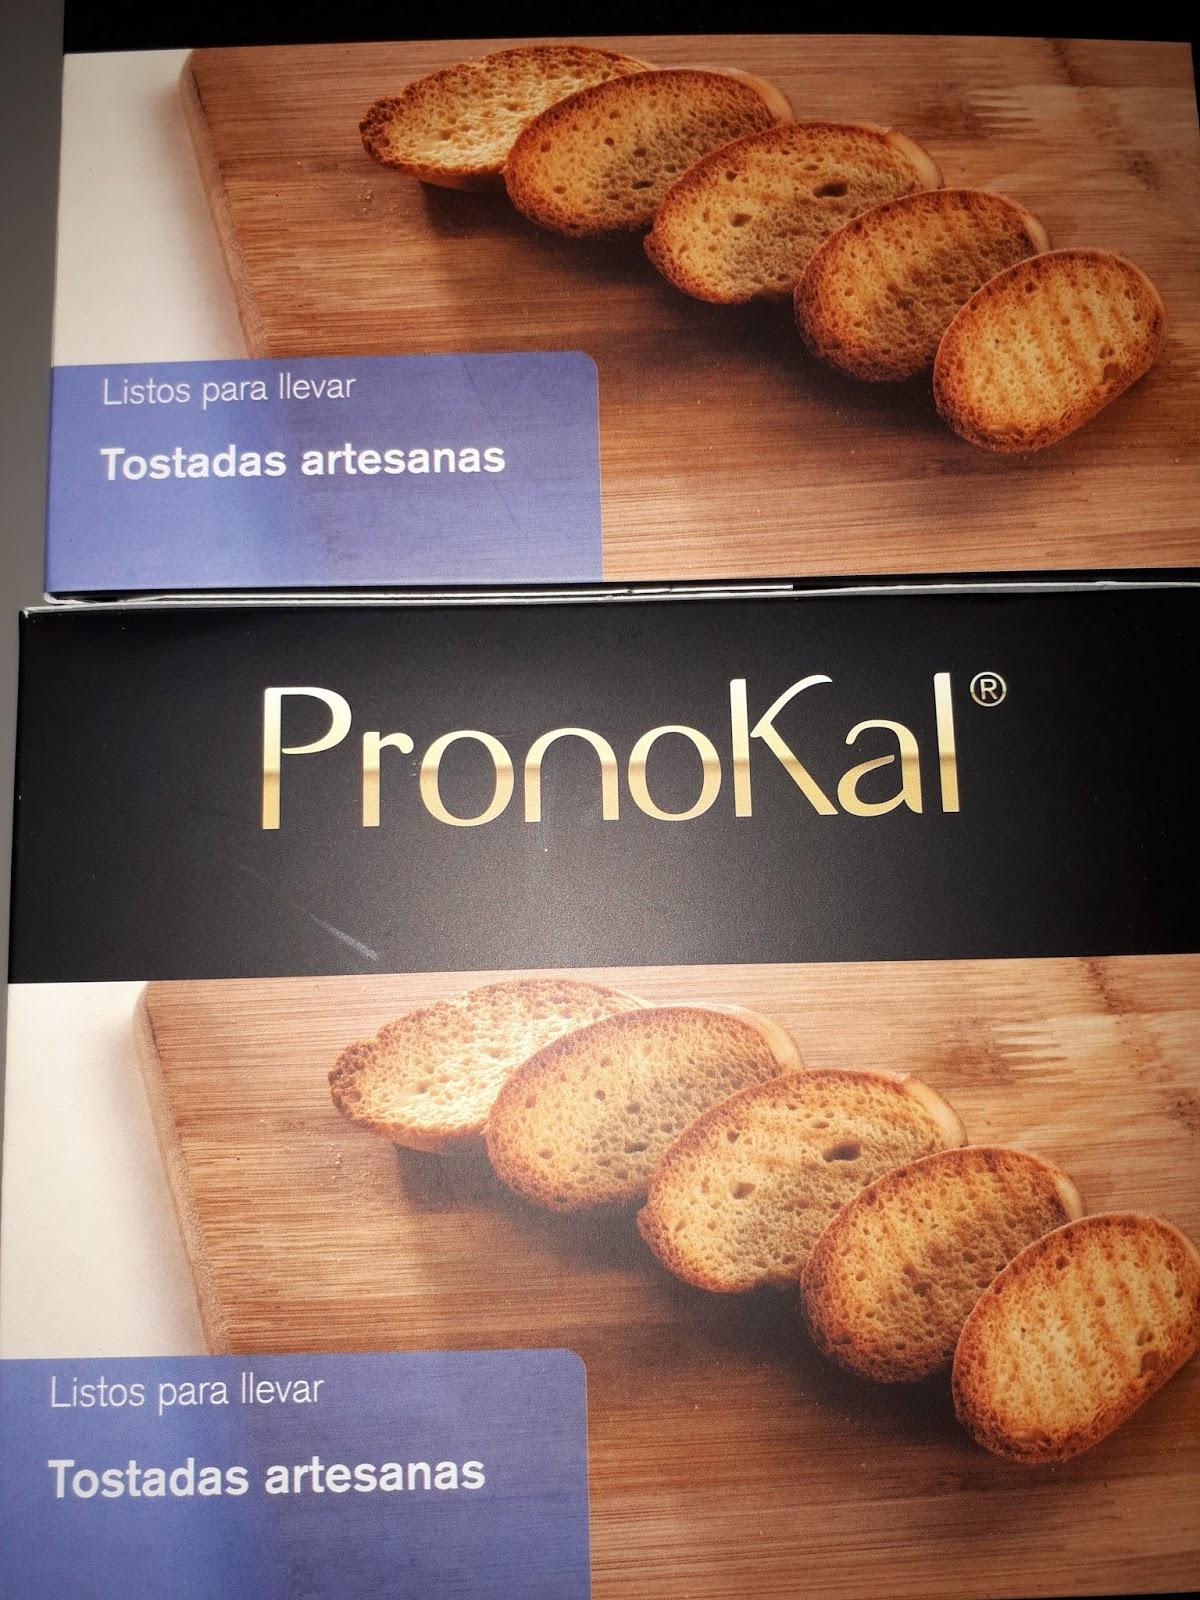 Dieta pronokal usa